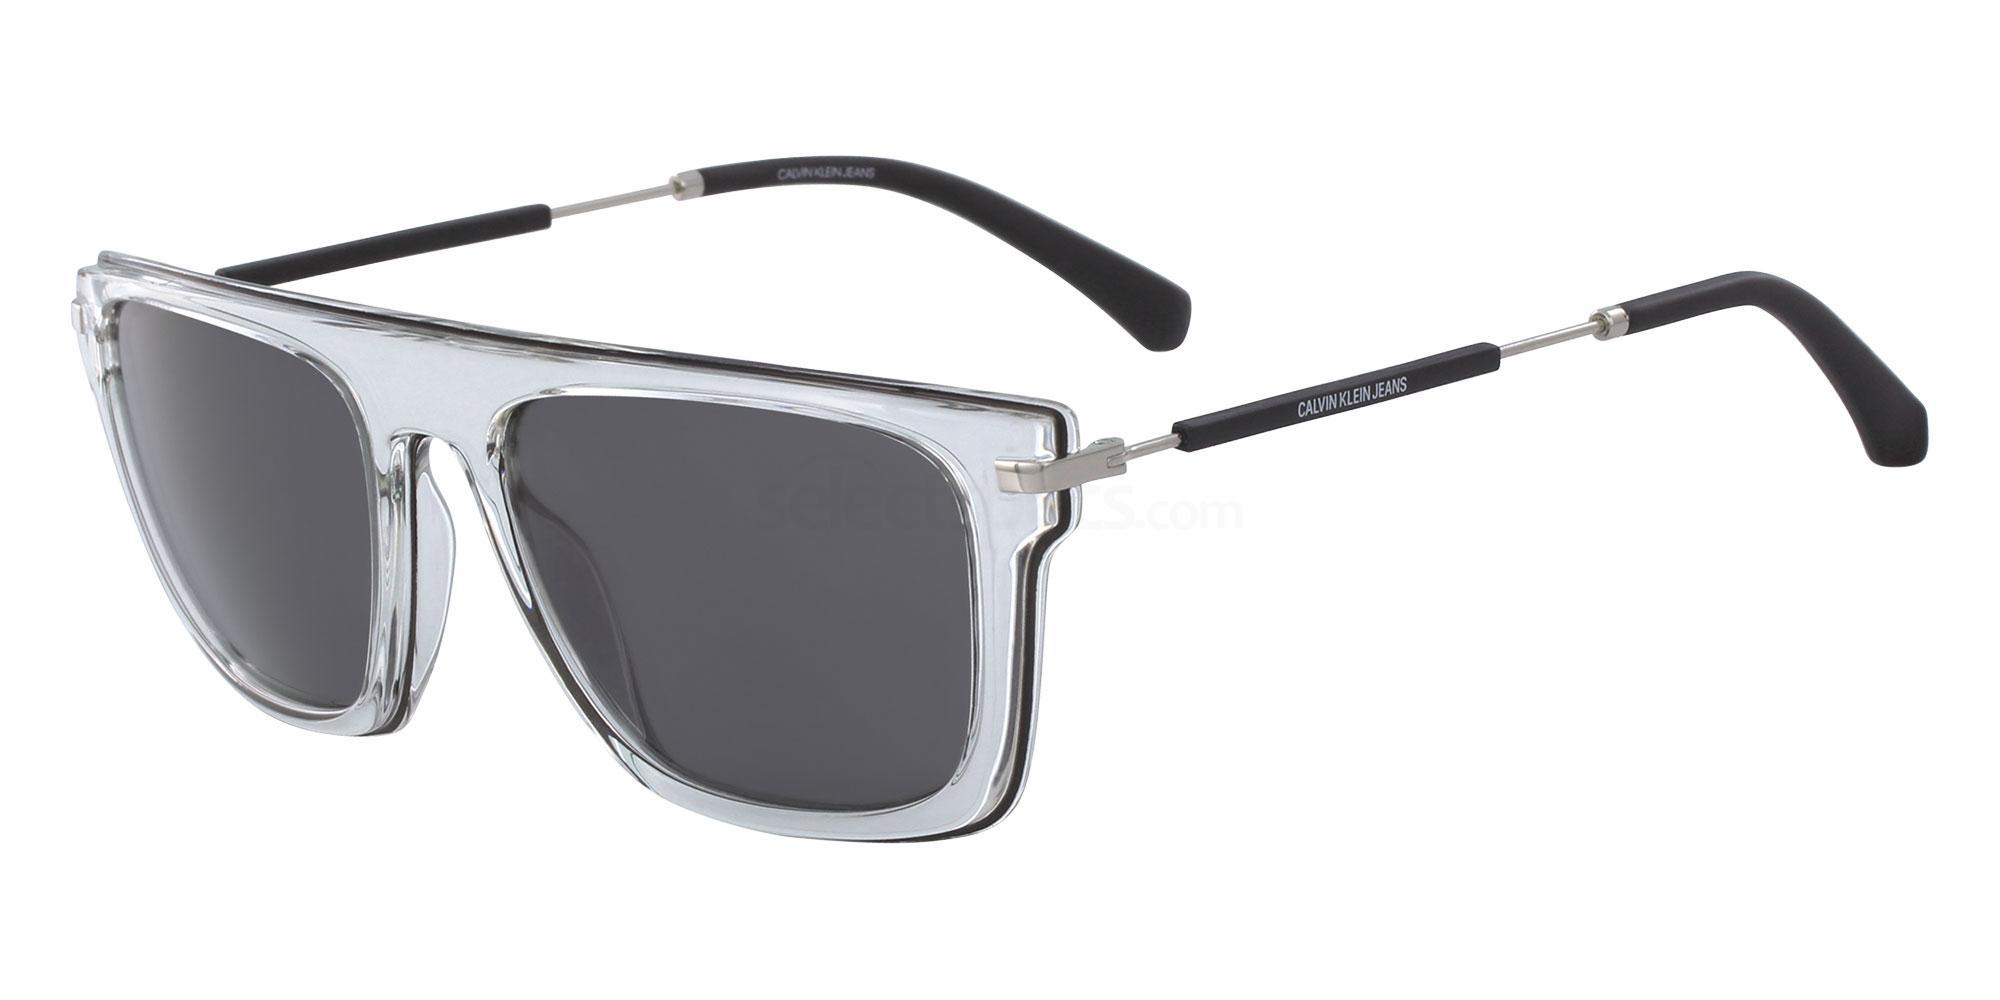 001 CKJ19705S Sunglasses, Calvin Klein Jeans